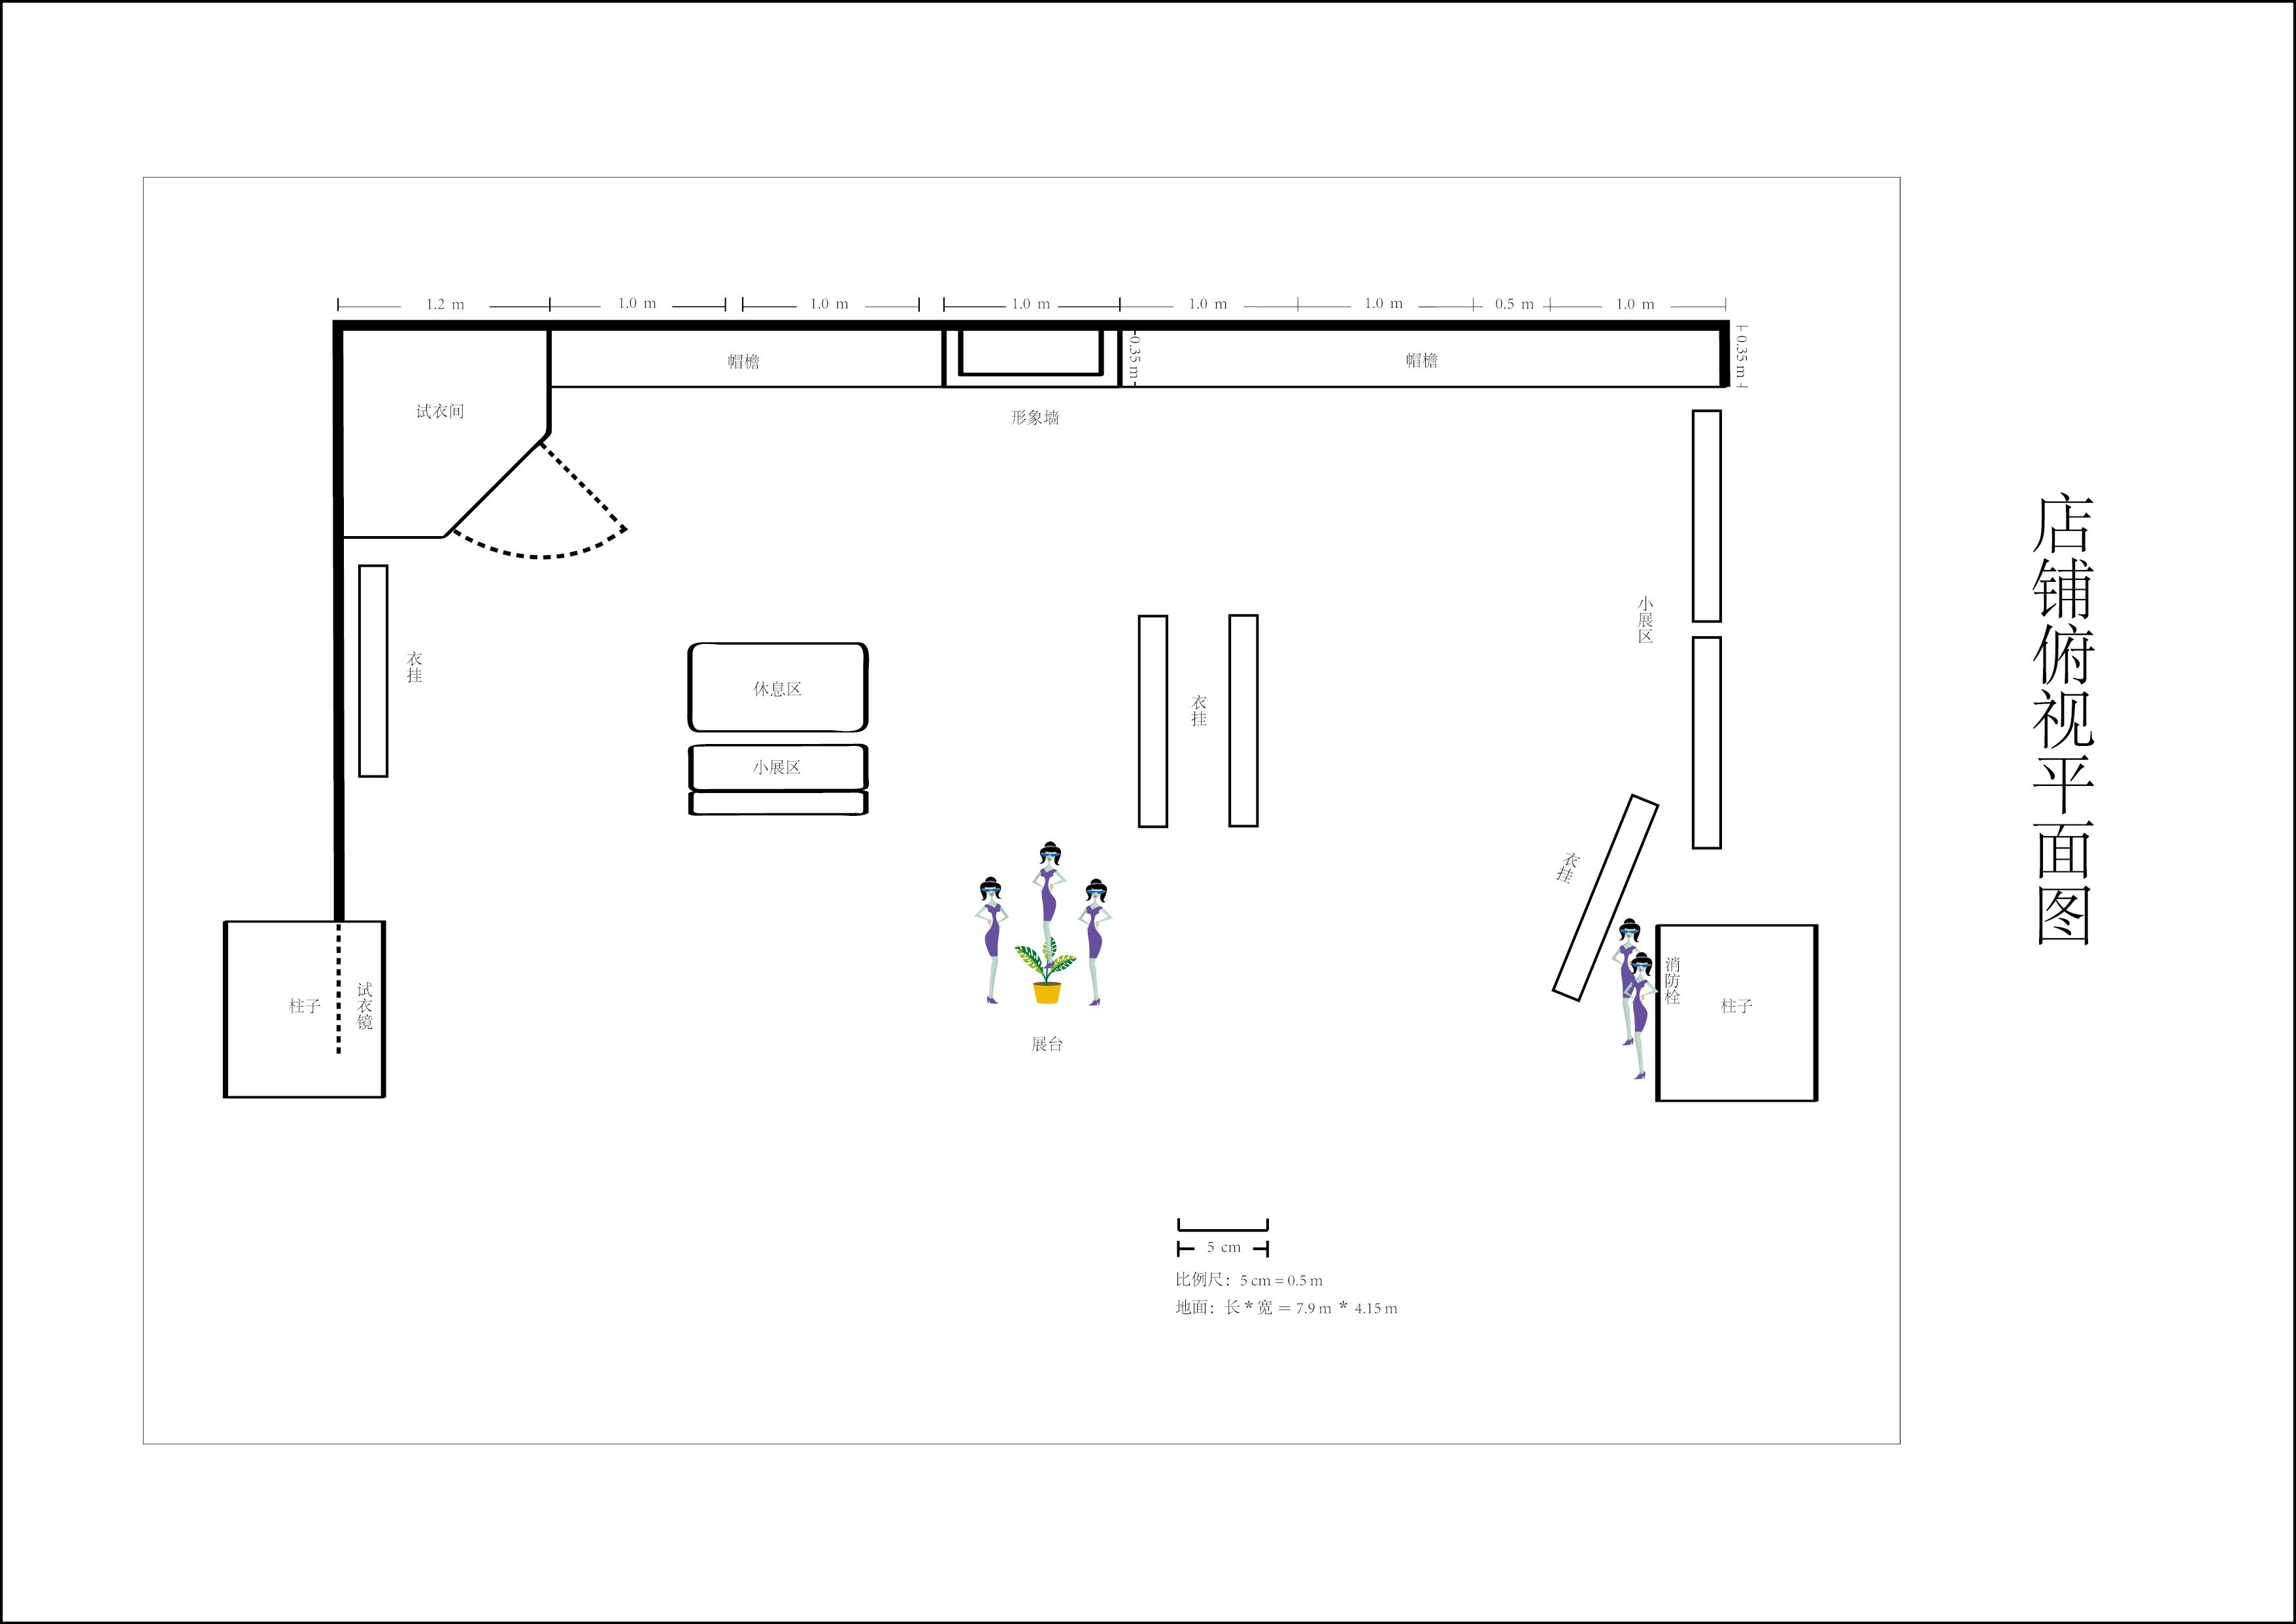 miumiu服装店铺设计|空间|展示设计 |carol_cat0迷儿